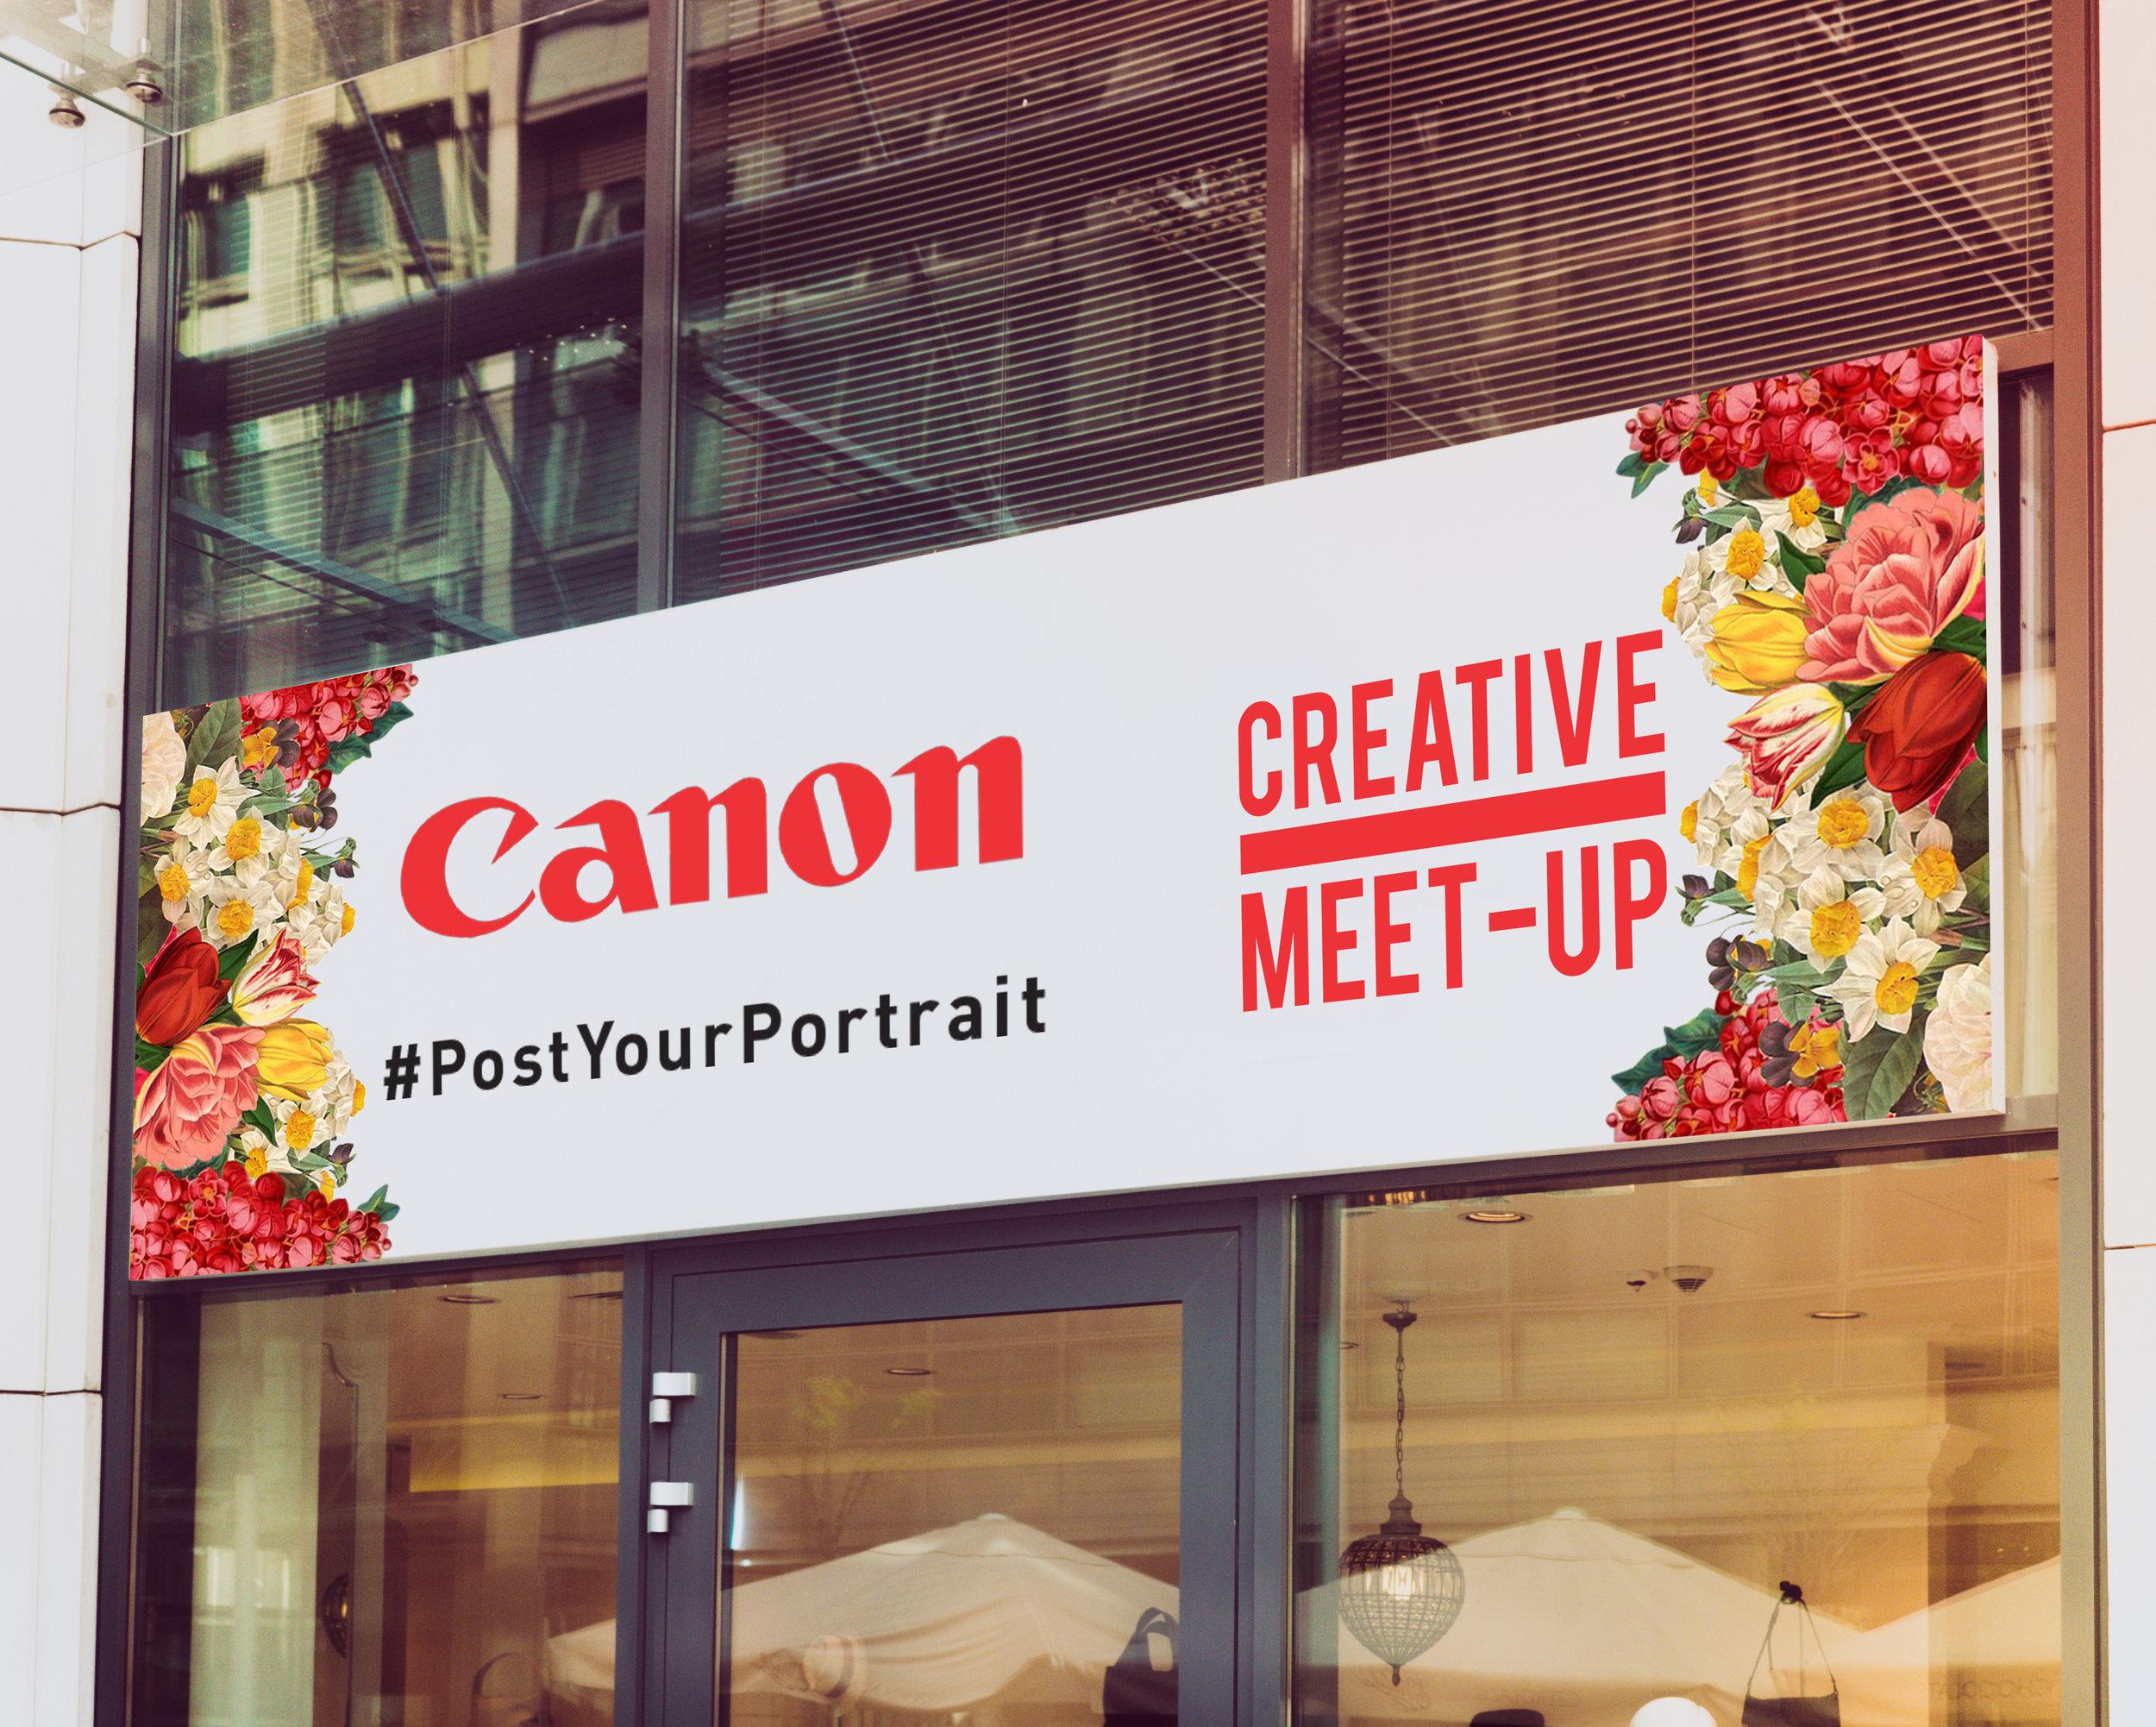 Creative-Meetup.jpg